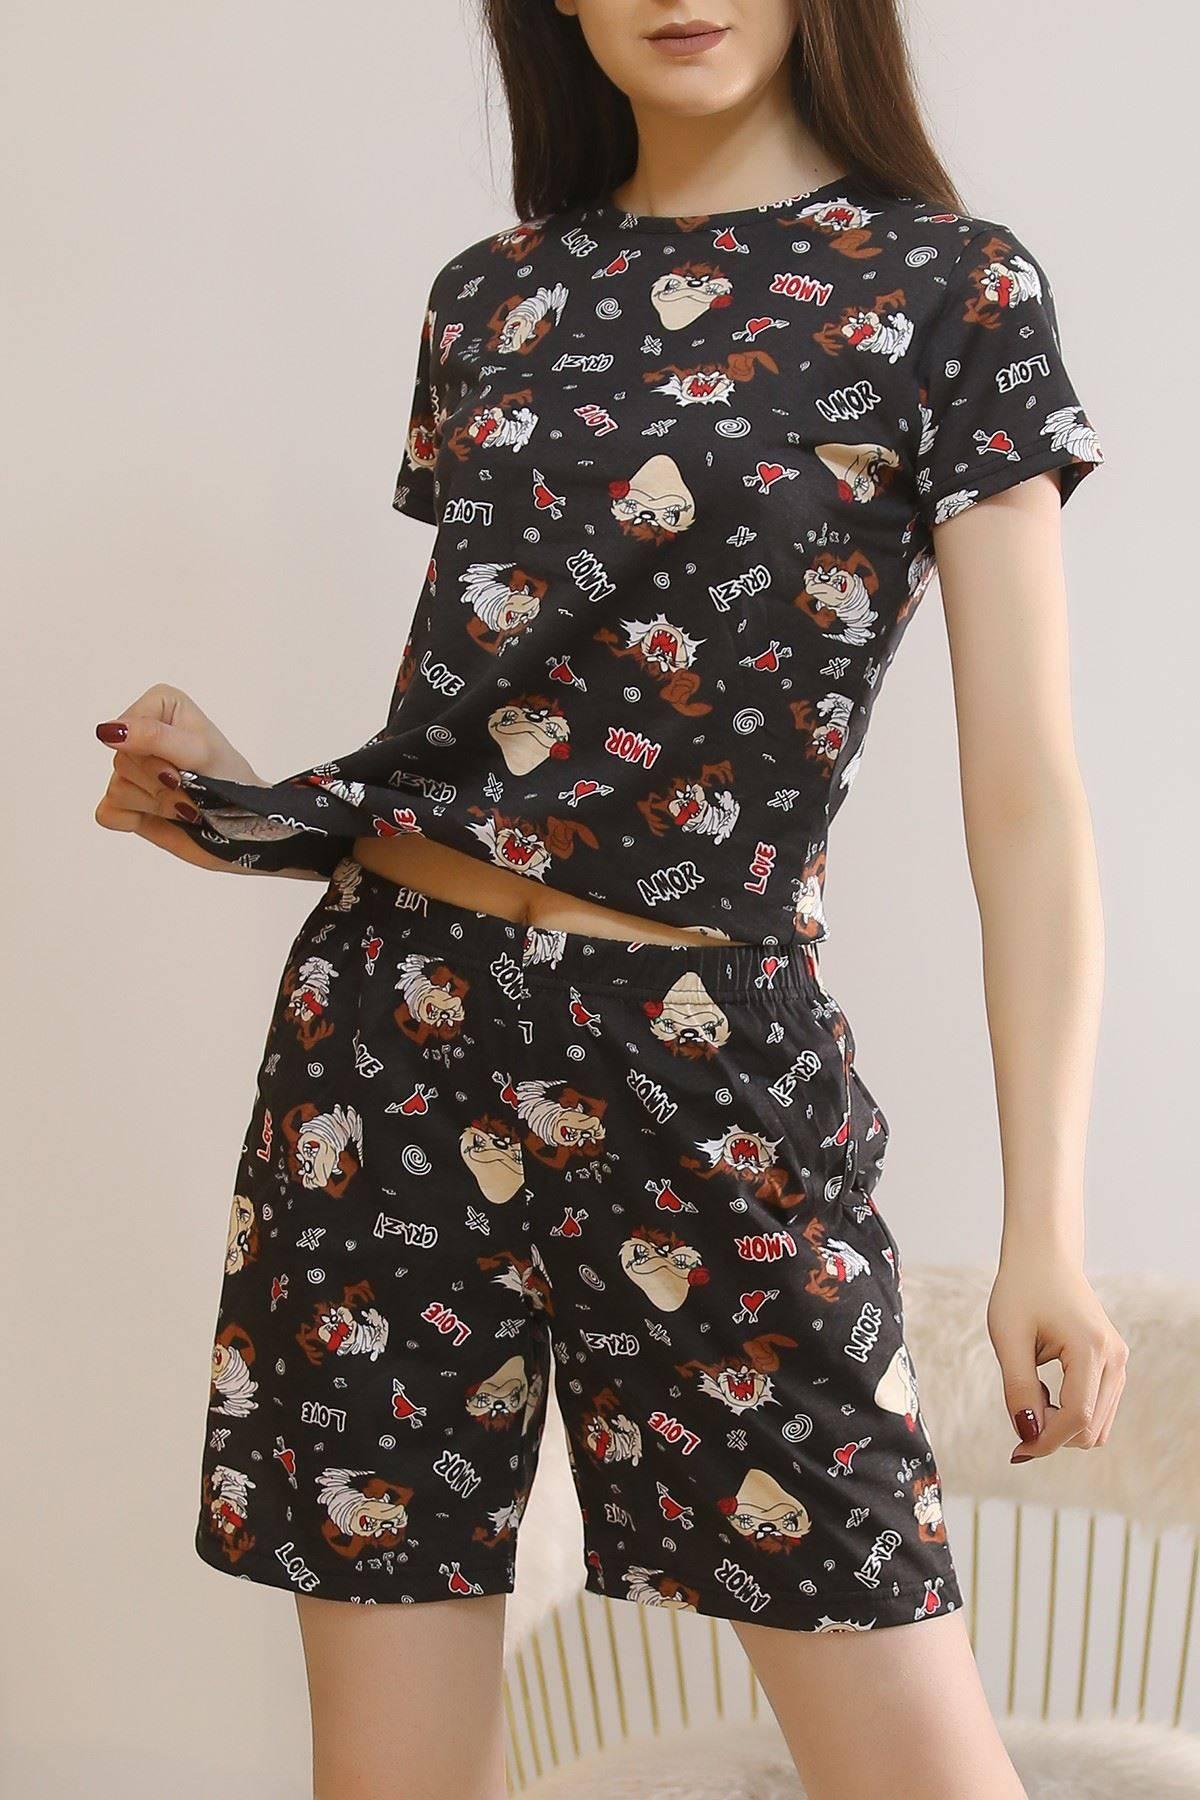 Şortlu Pijama Takımı Siyah2 - 5924.1059.